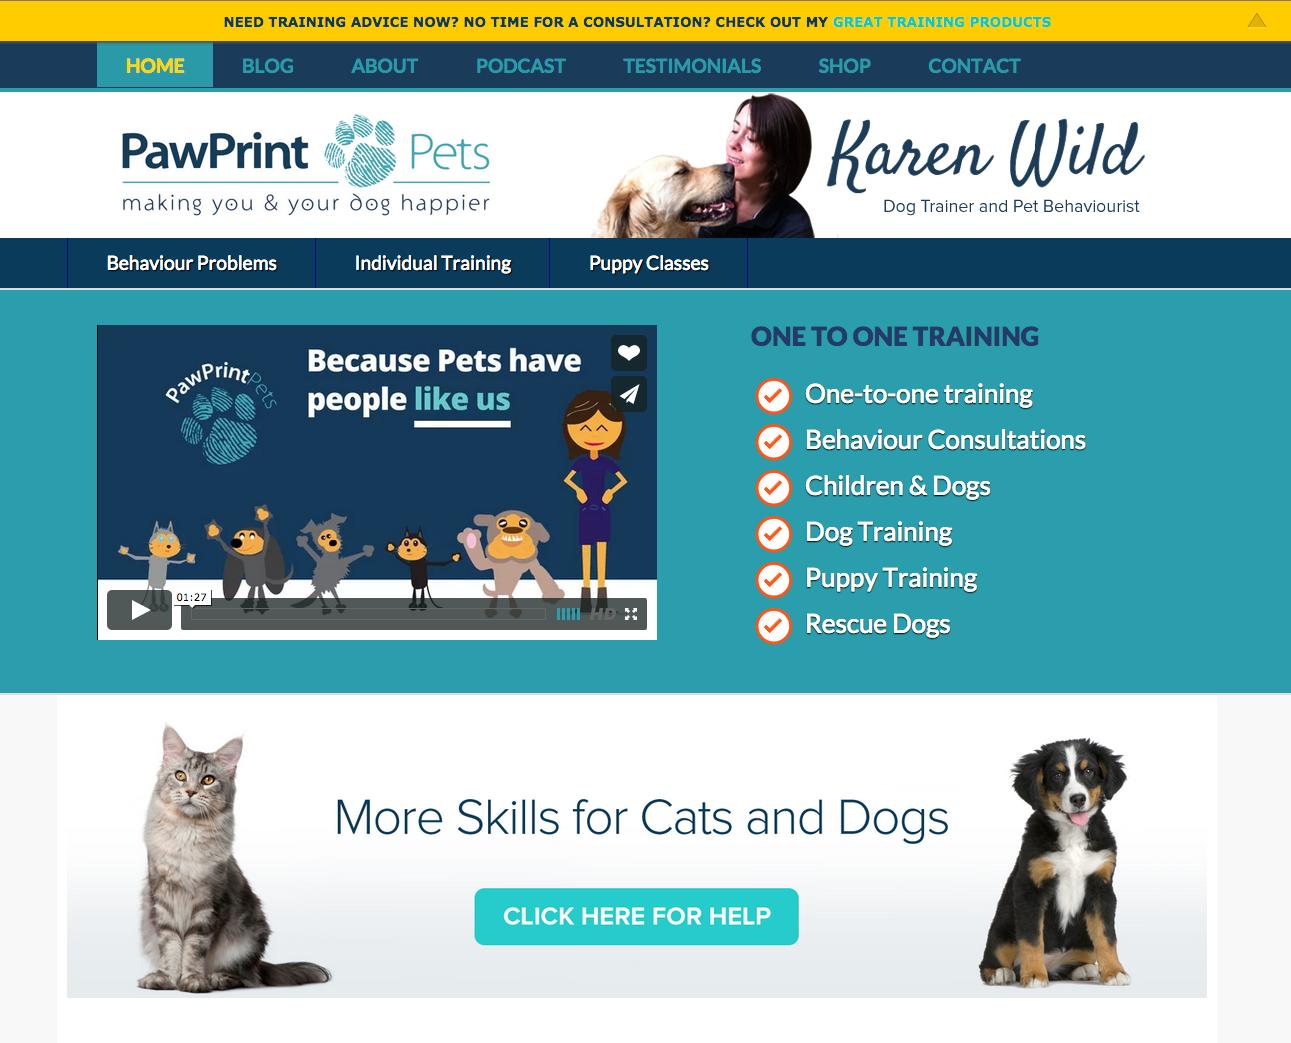 PawPrint Pets website